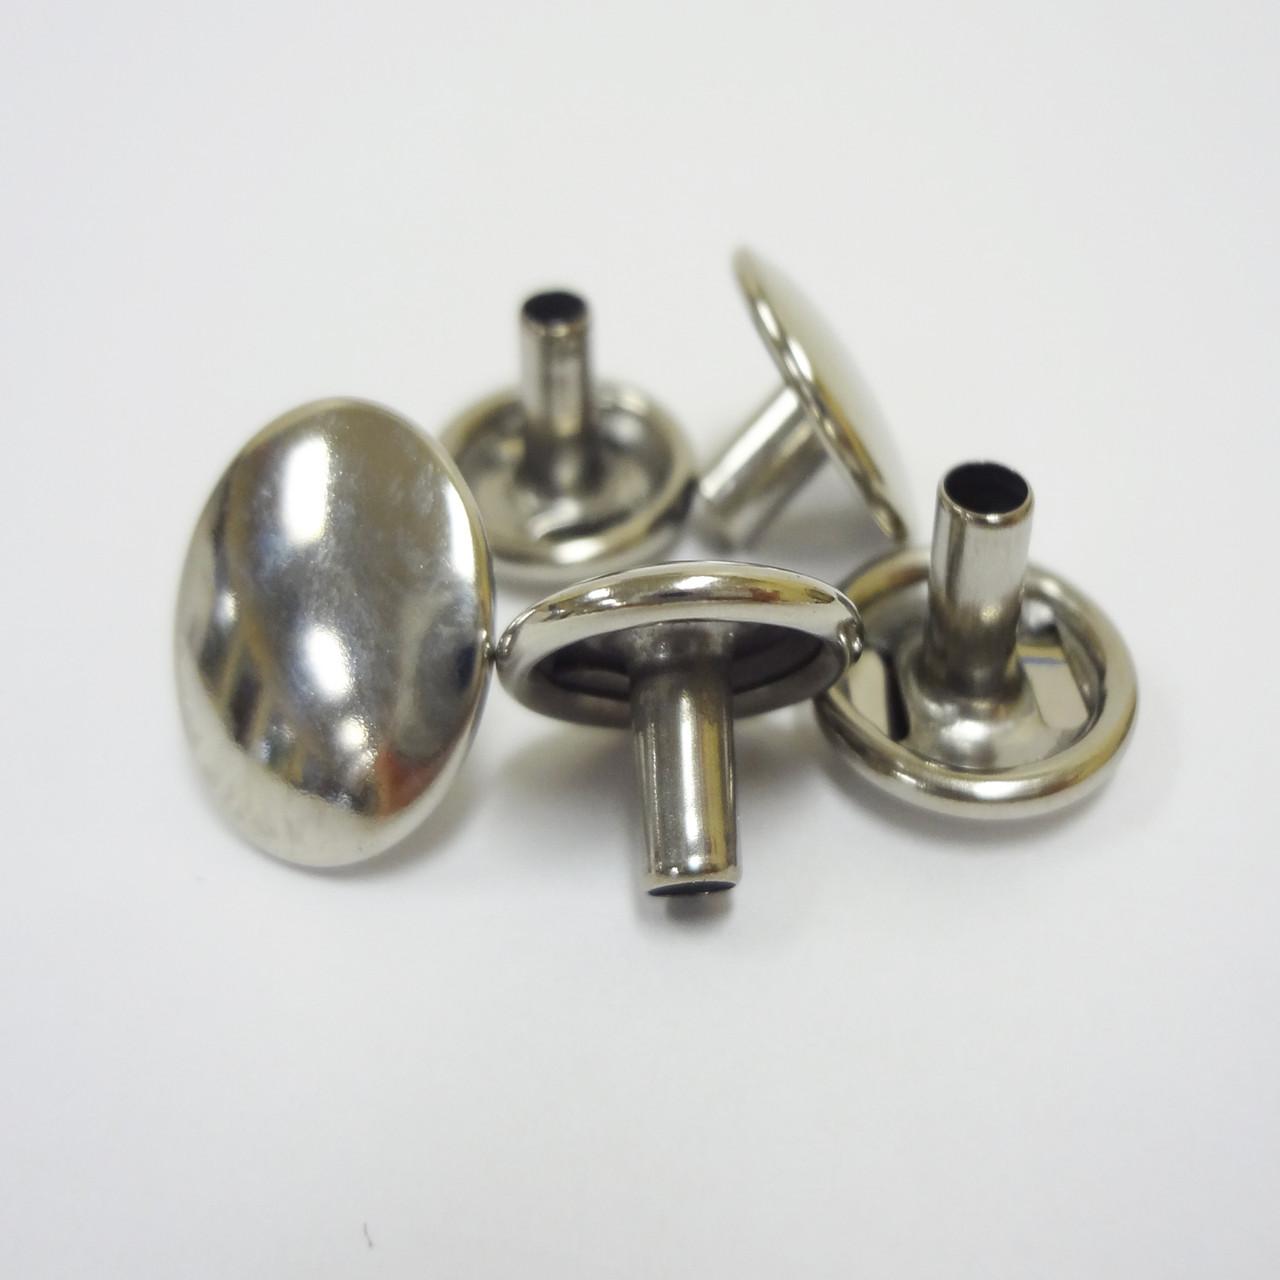 "Snap Fastener Button Cap - 1/4"" Stem - Stainless Steel"